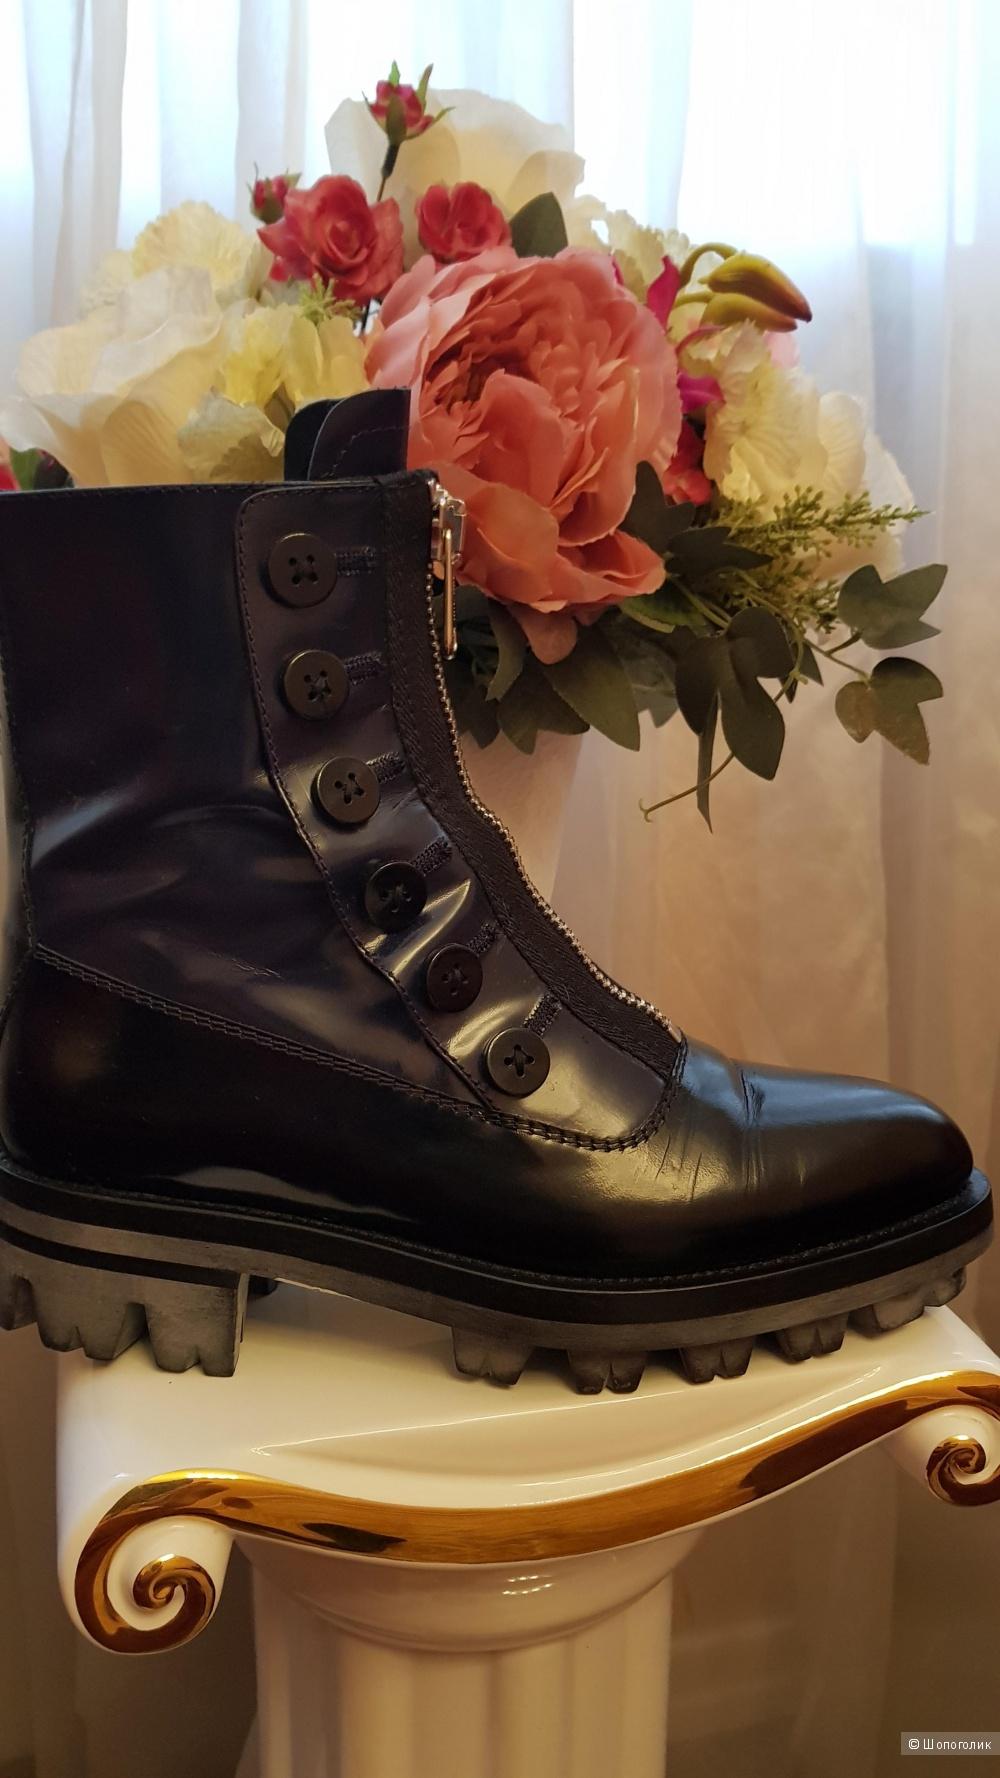 Ботинки, Miu Miu , 39,5 размер